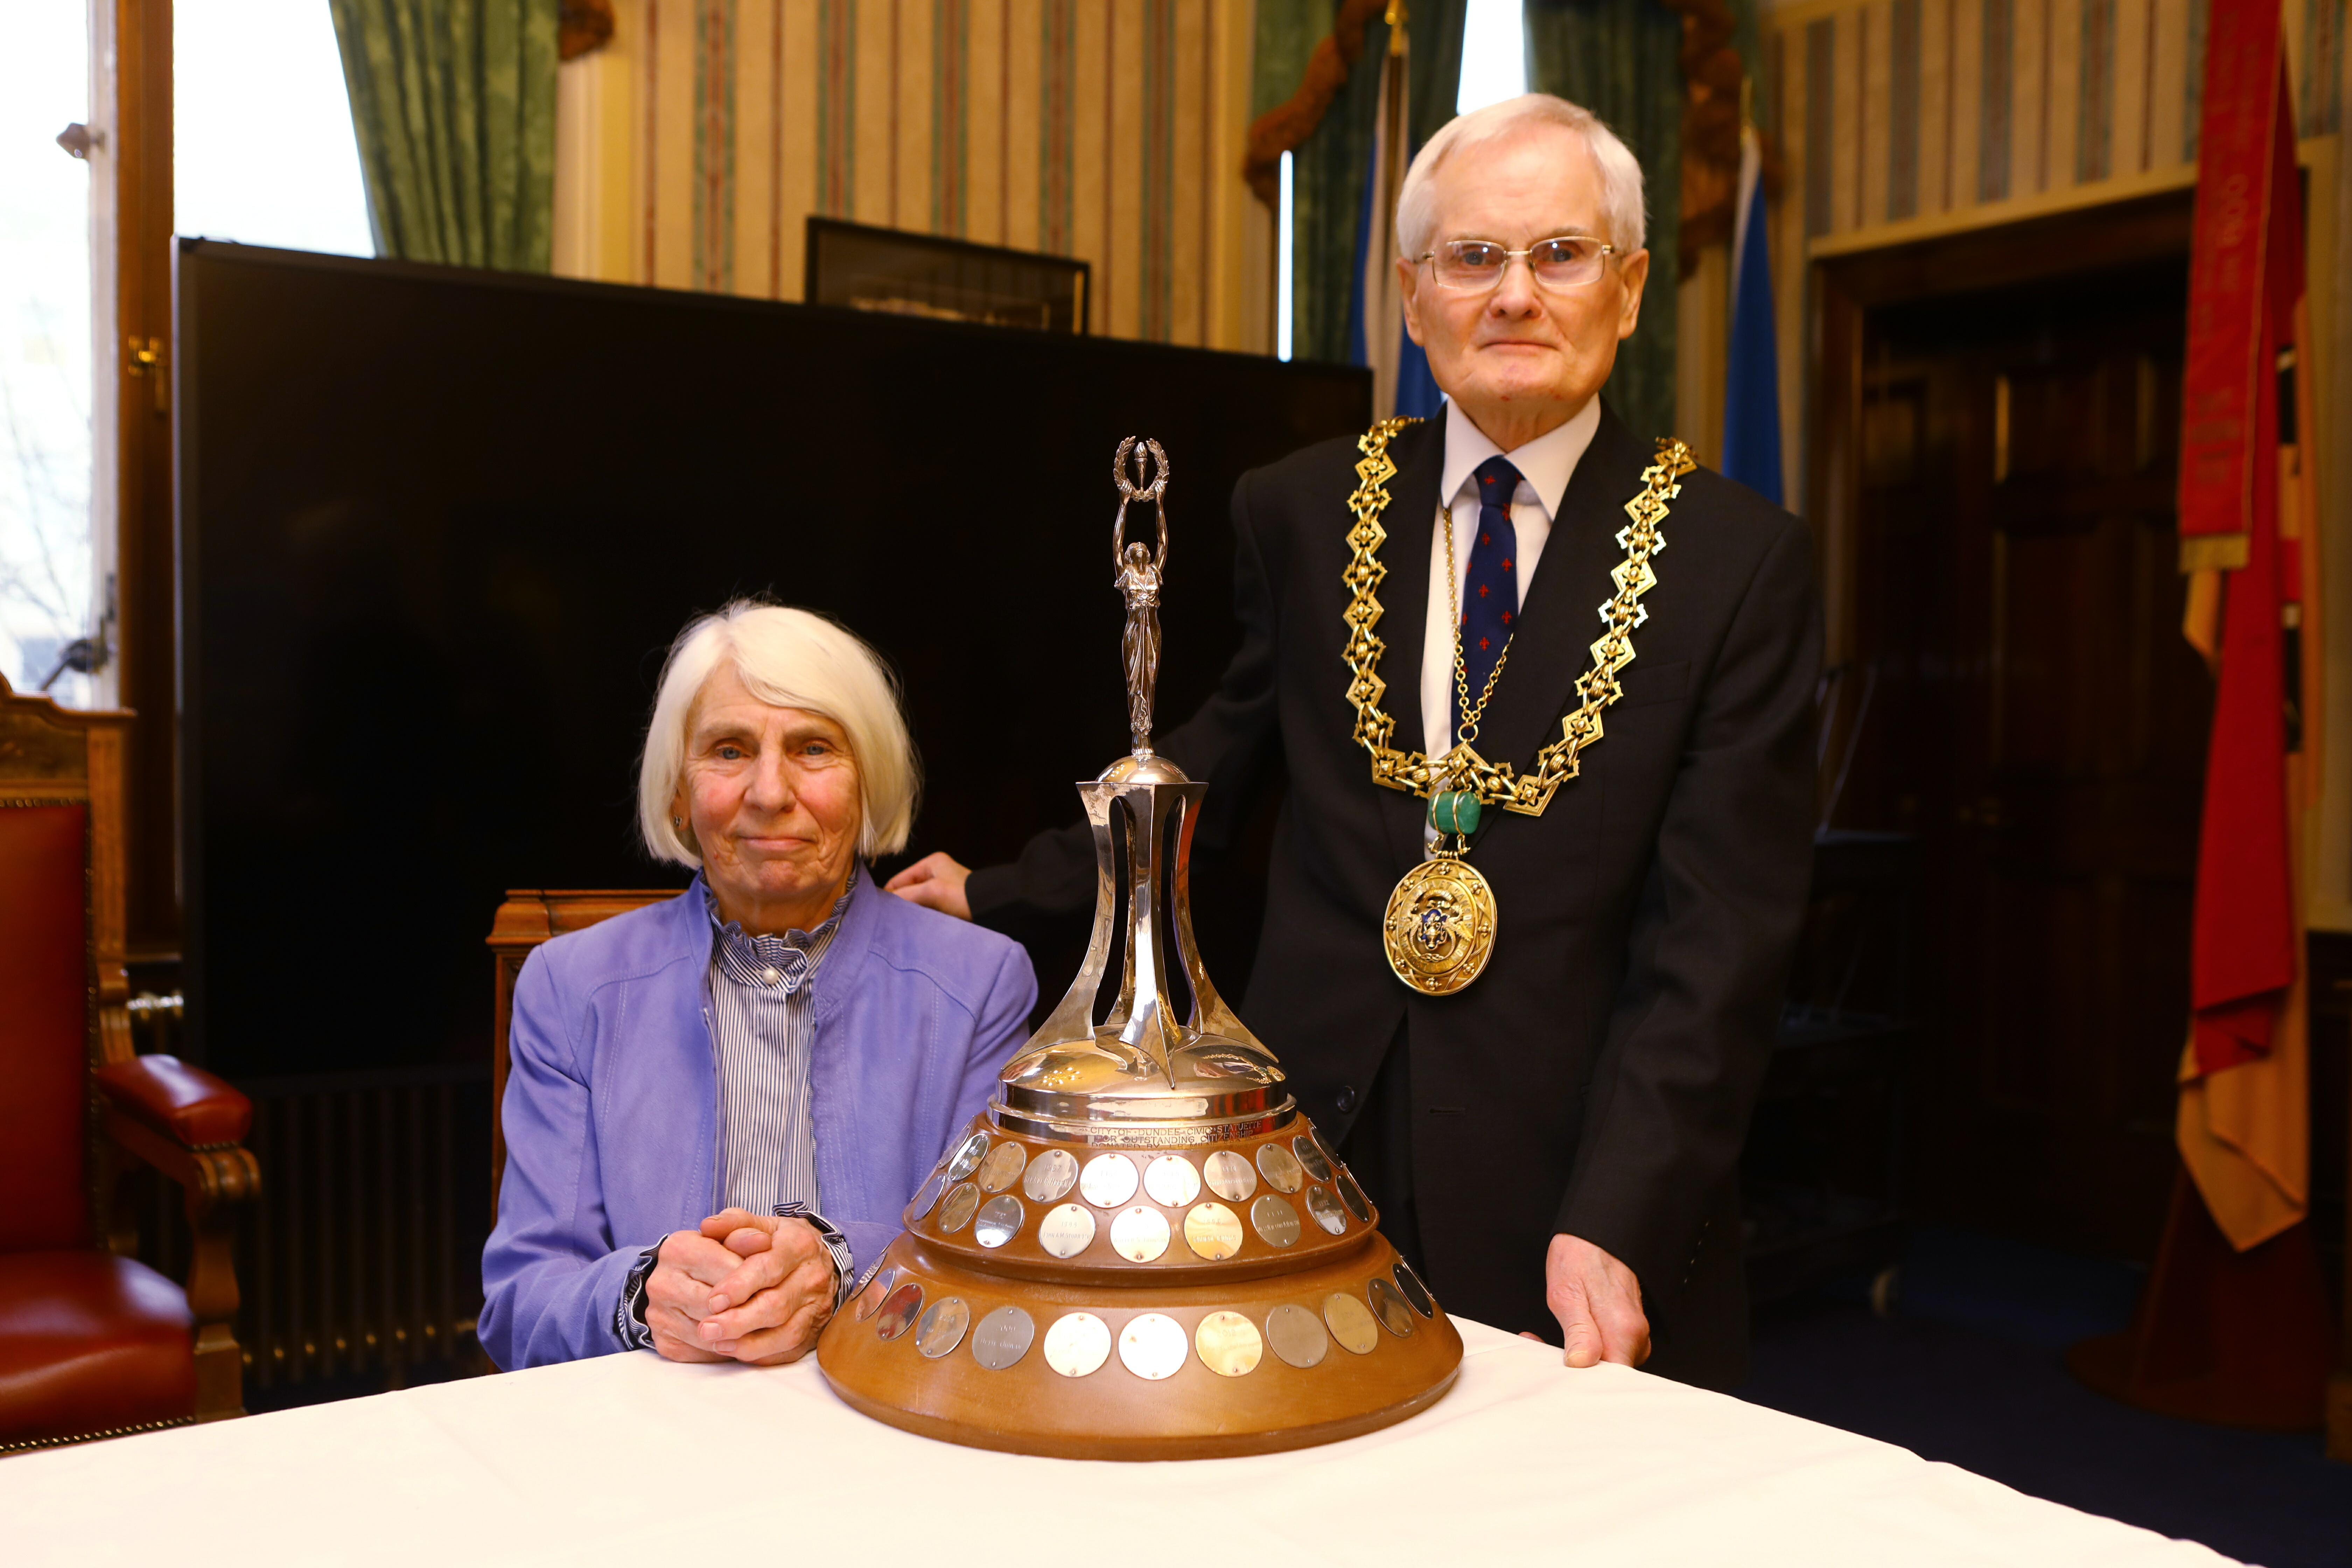 Norma alongside Lord Provost Ian Borthwick